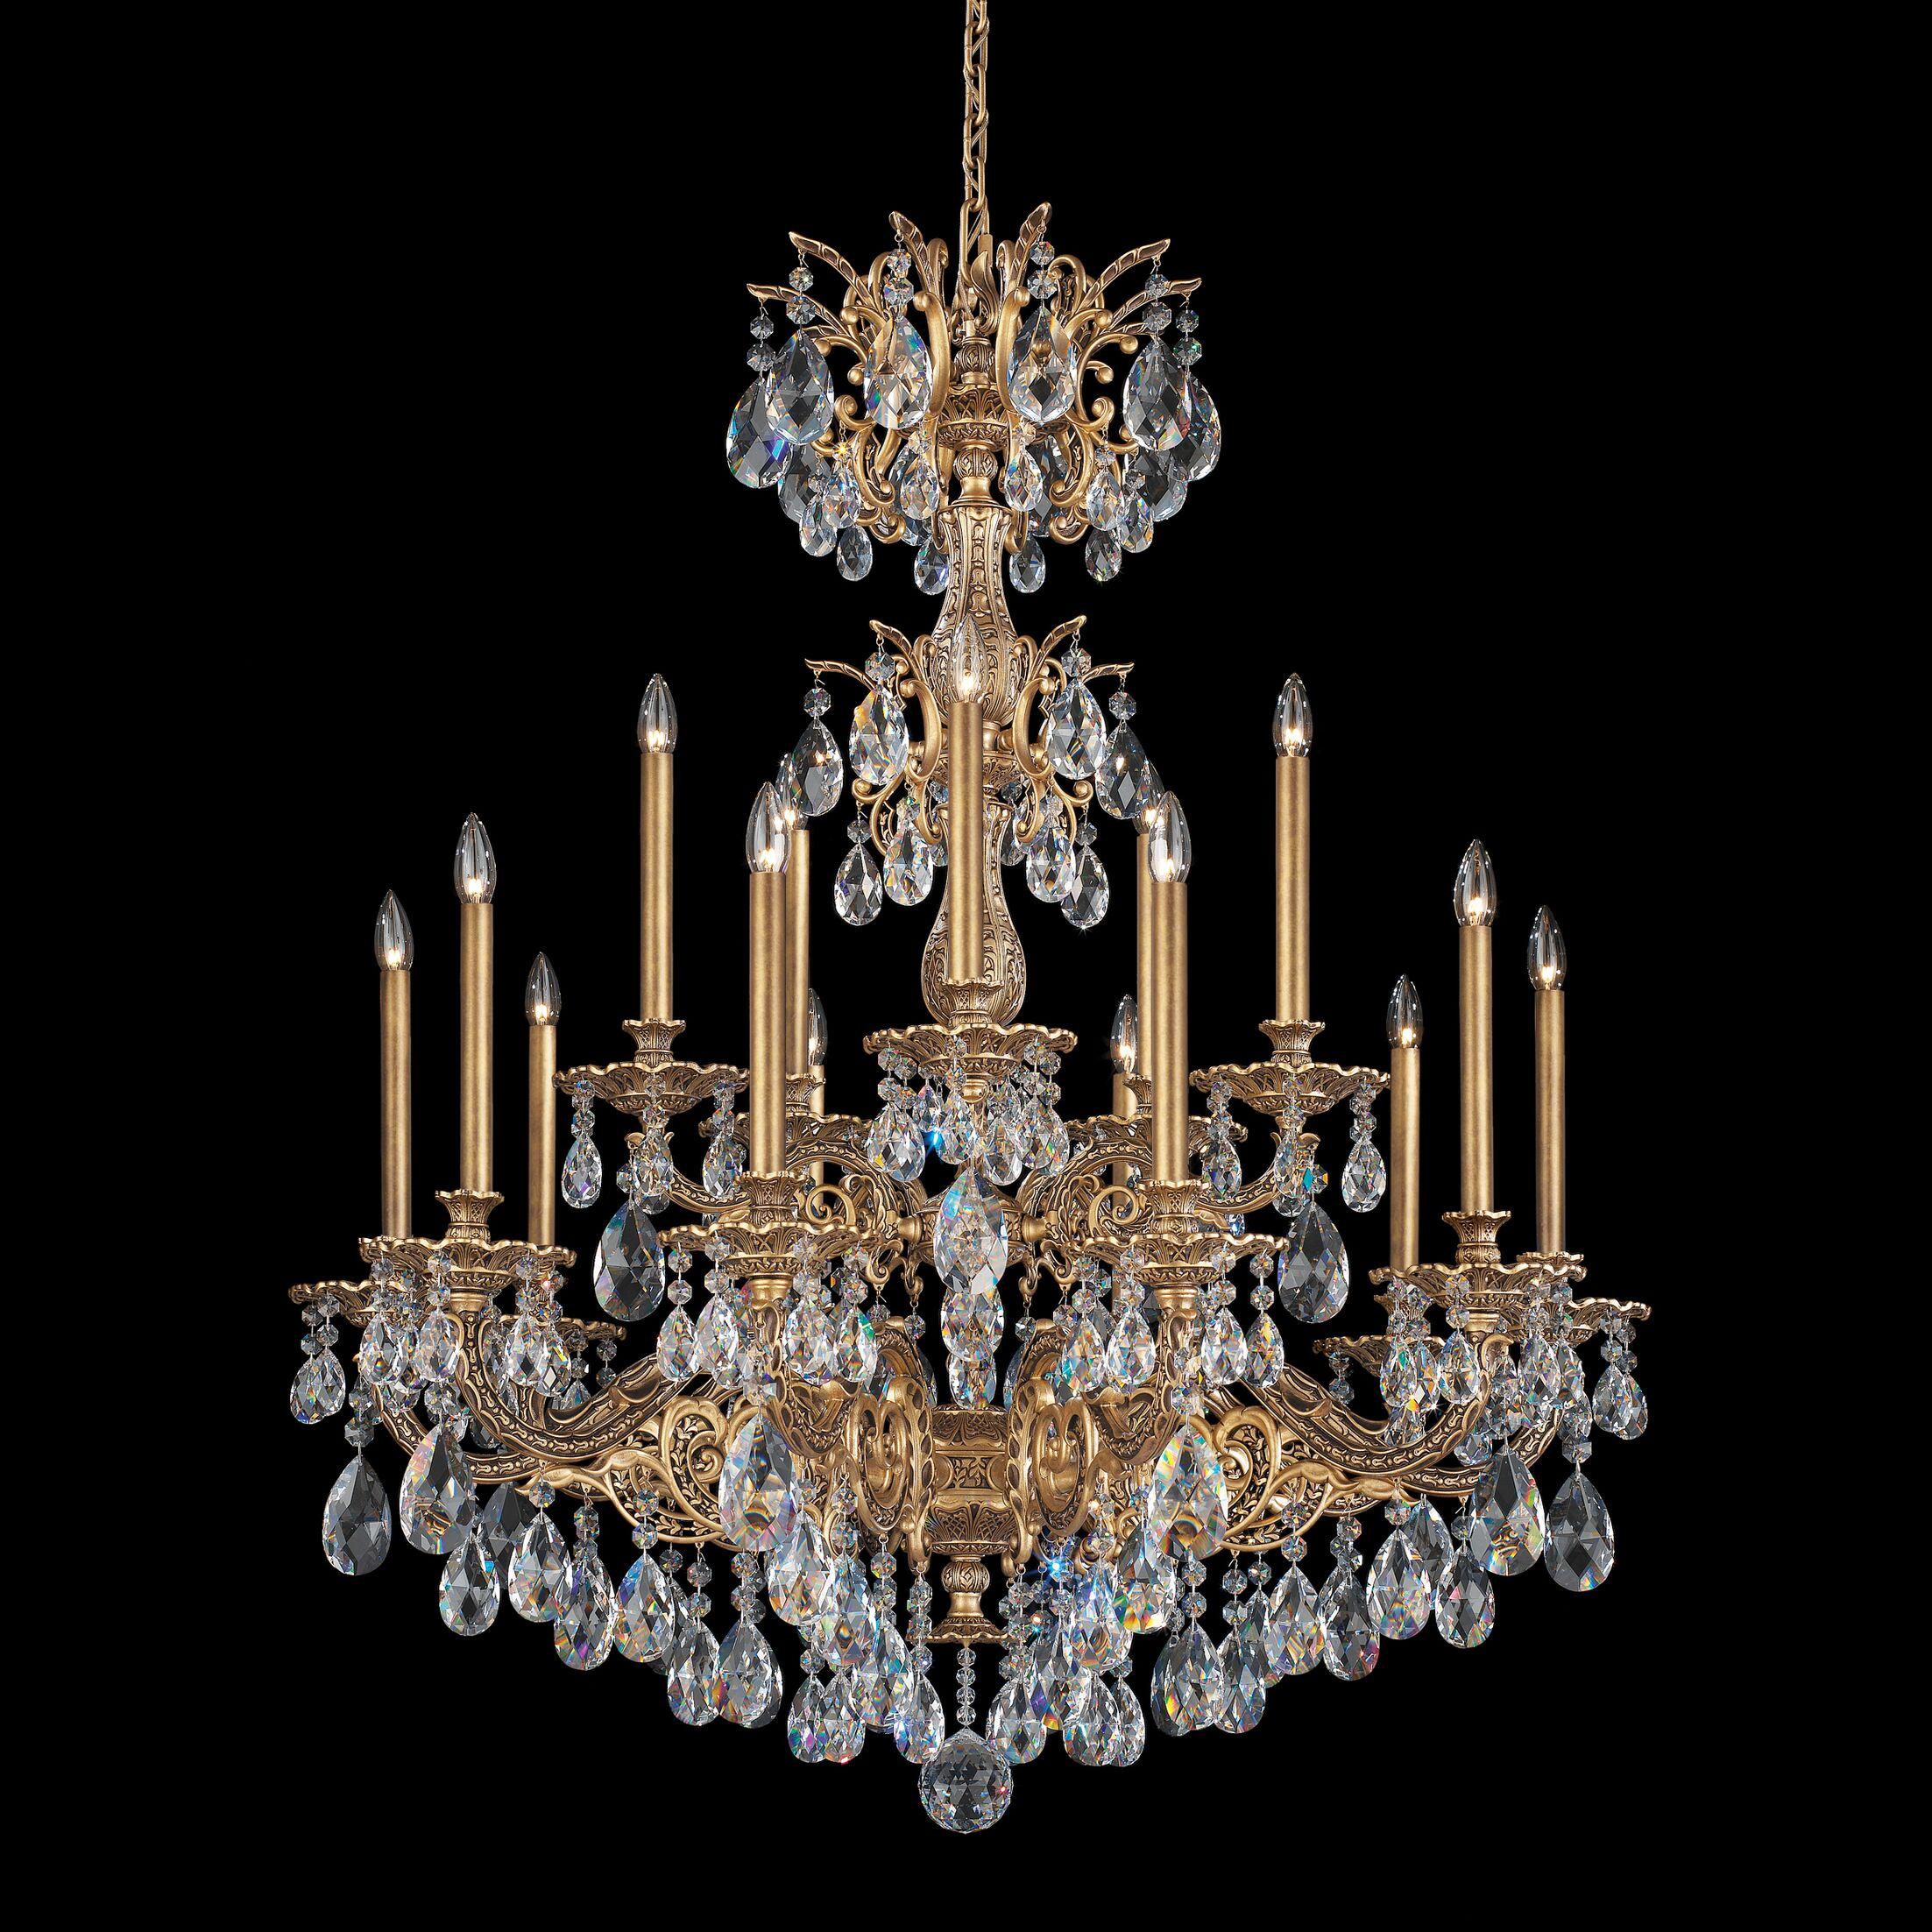 Milano 15-Light Chandelier Crystal Type: Optic Clear, Finish: Heirloom Bronze